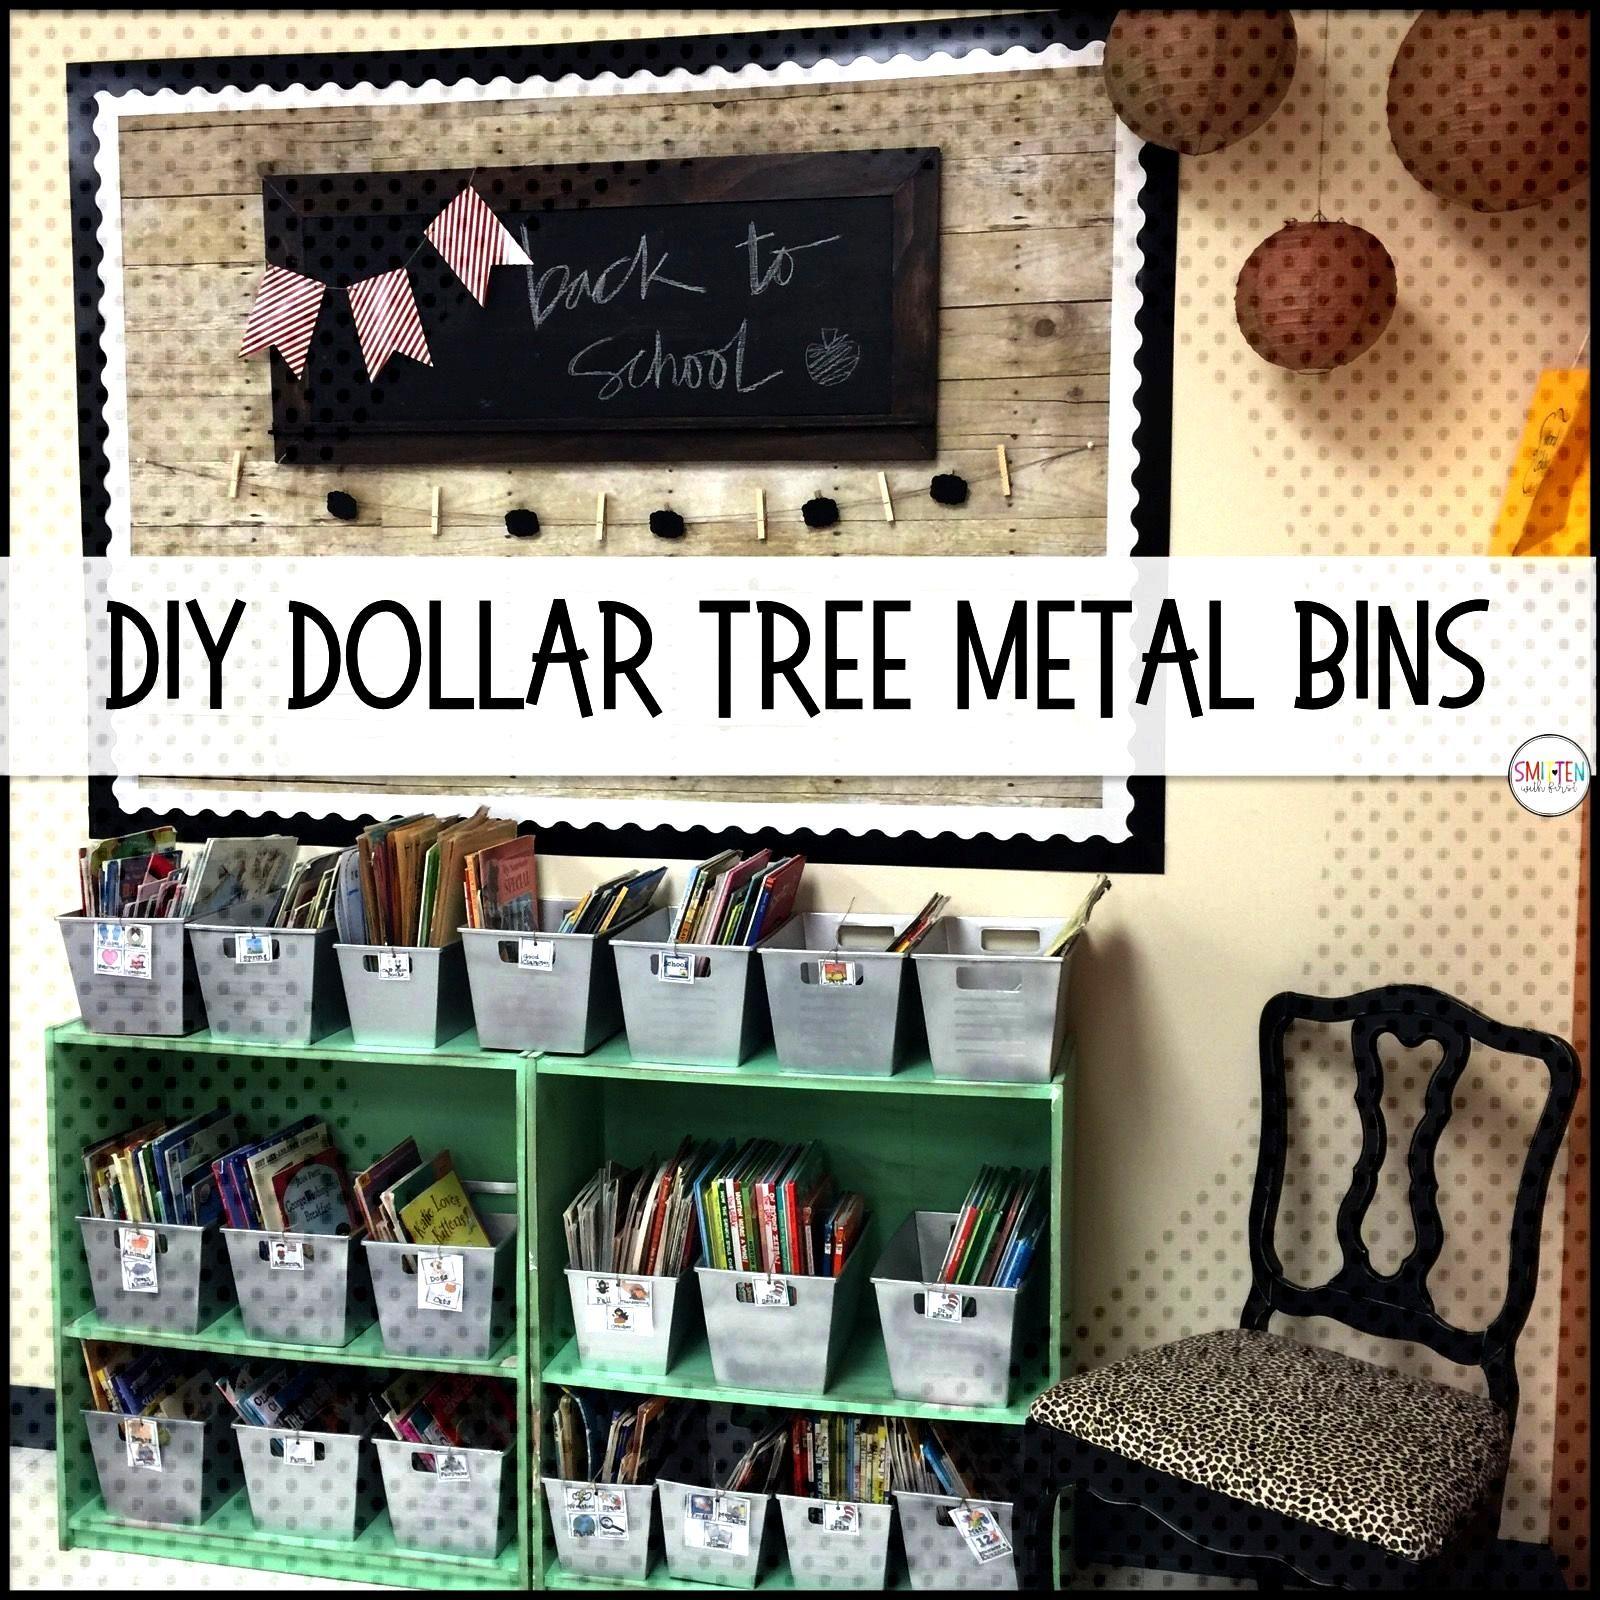 DIY Dollar Tree Metal Locker Bins farmhouse classroom -  DIY Dollar Tree Metal Locker Bins farmhous